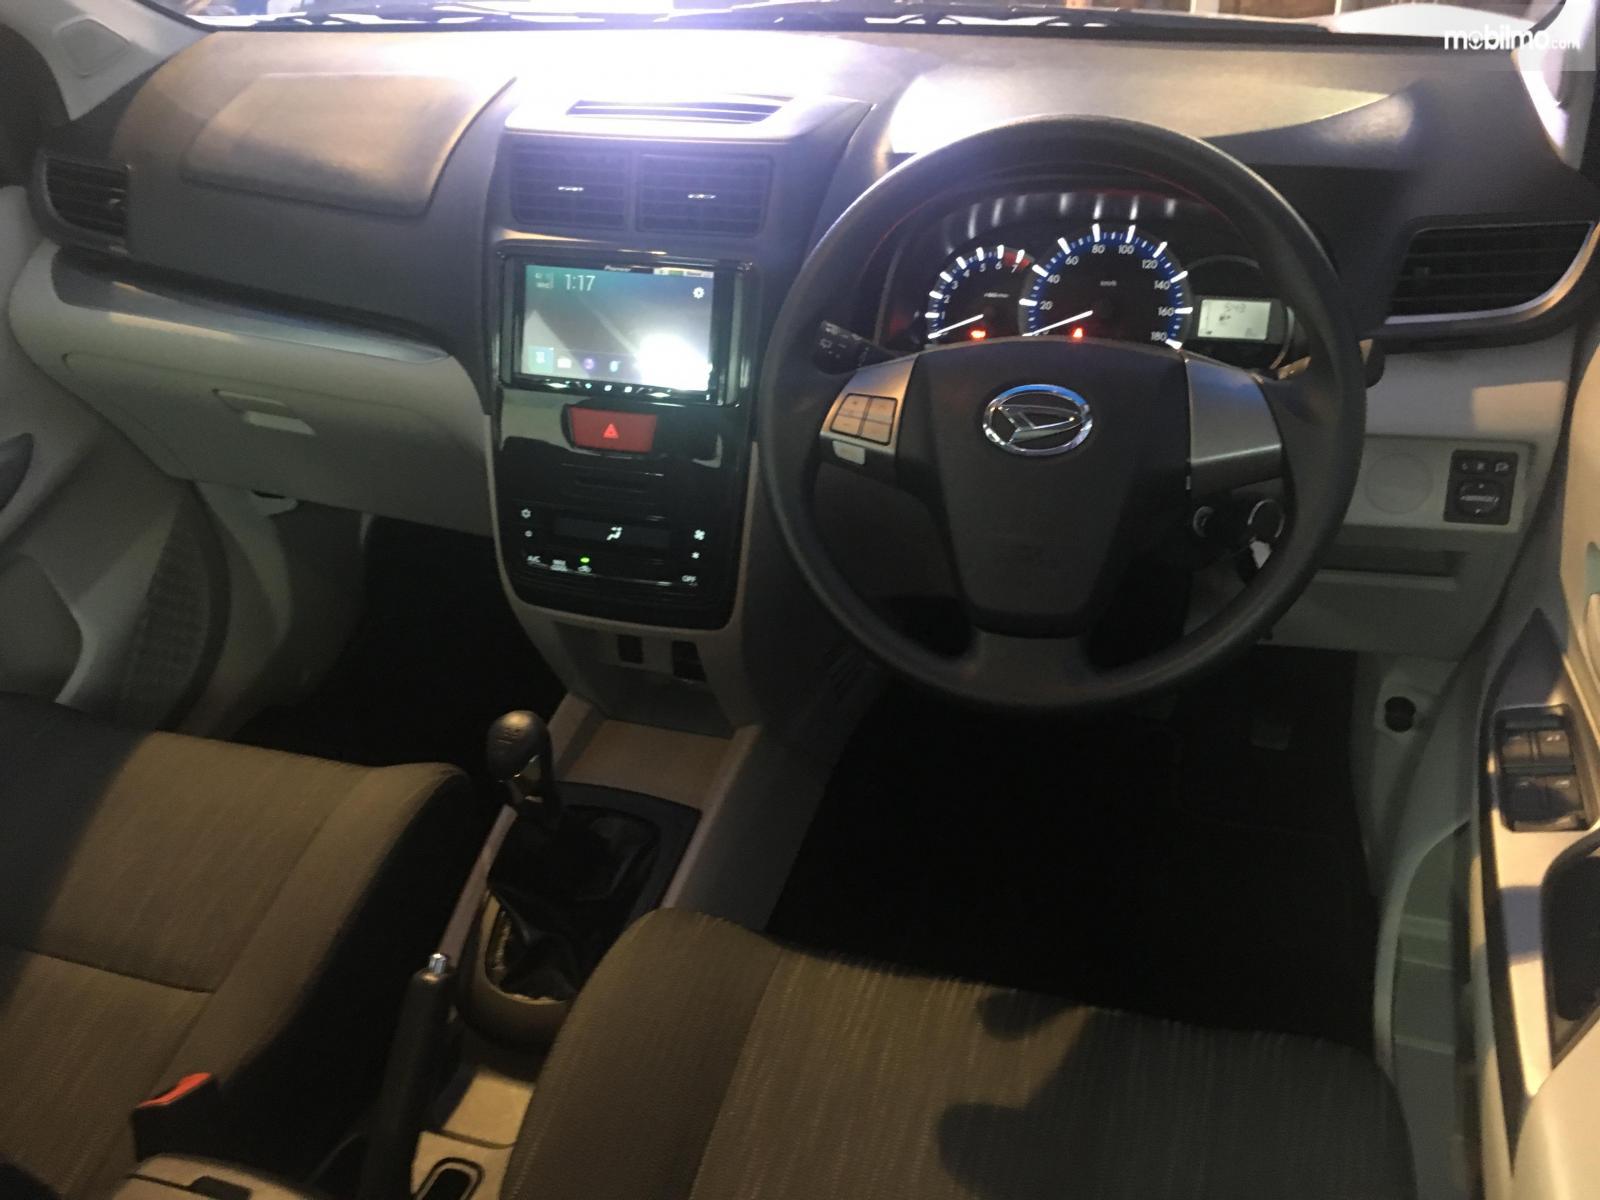 Tampak Layout dasbor Daihatsu Grand New Xenia R M/T 1.5 Deluxe 2019